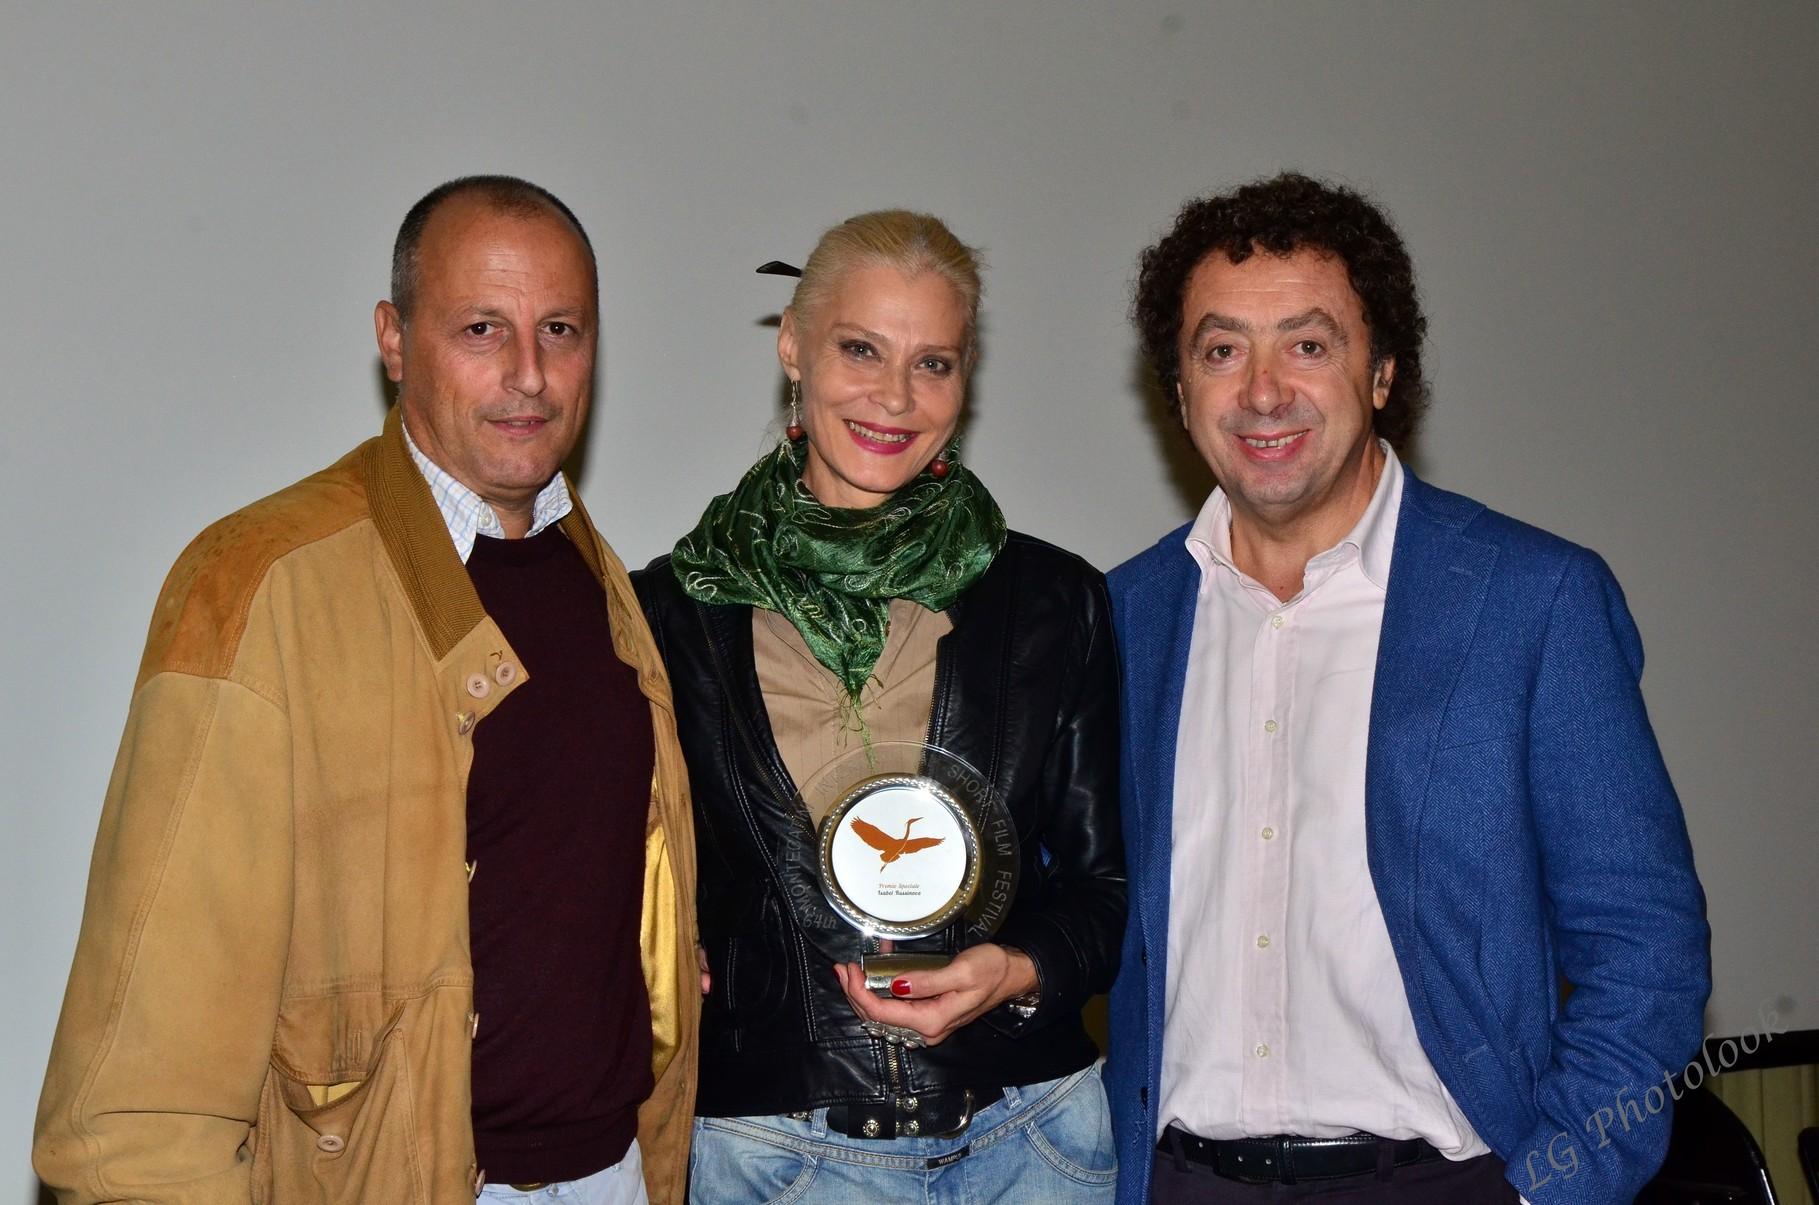 Rodolfo Martinelli (regista), Isabel Russinova (attrice), Marcello Zeppi (Presidente MISFF)